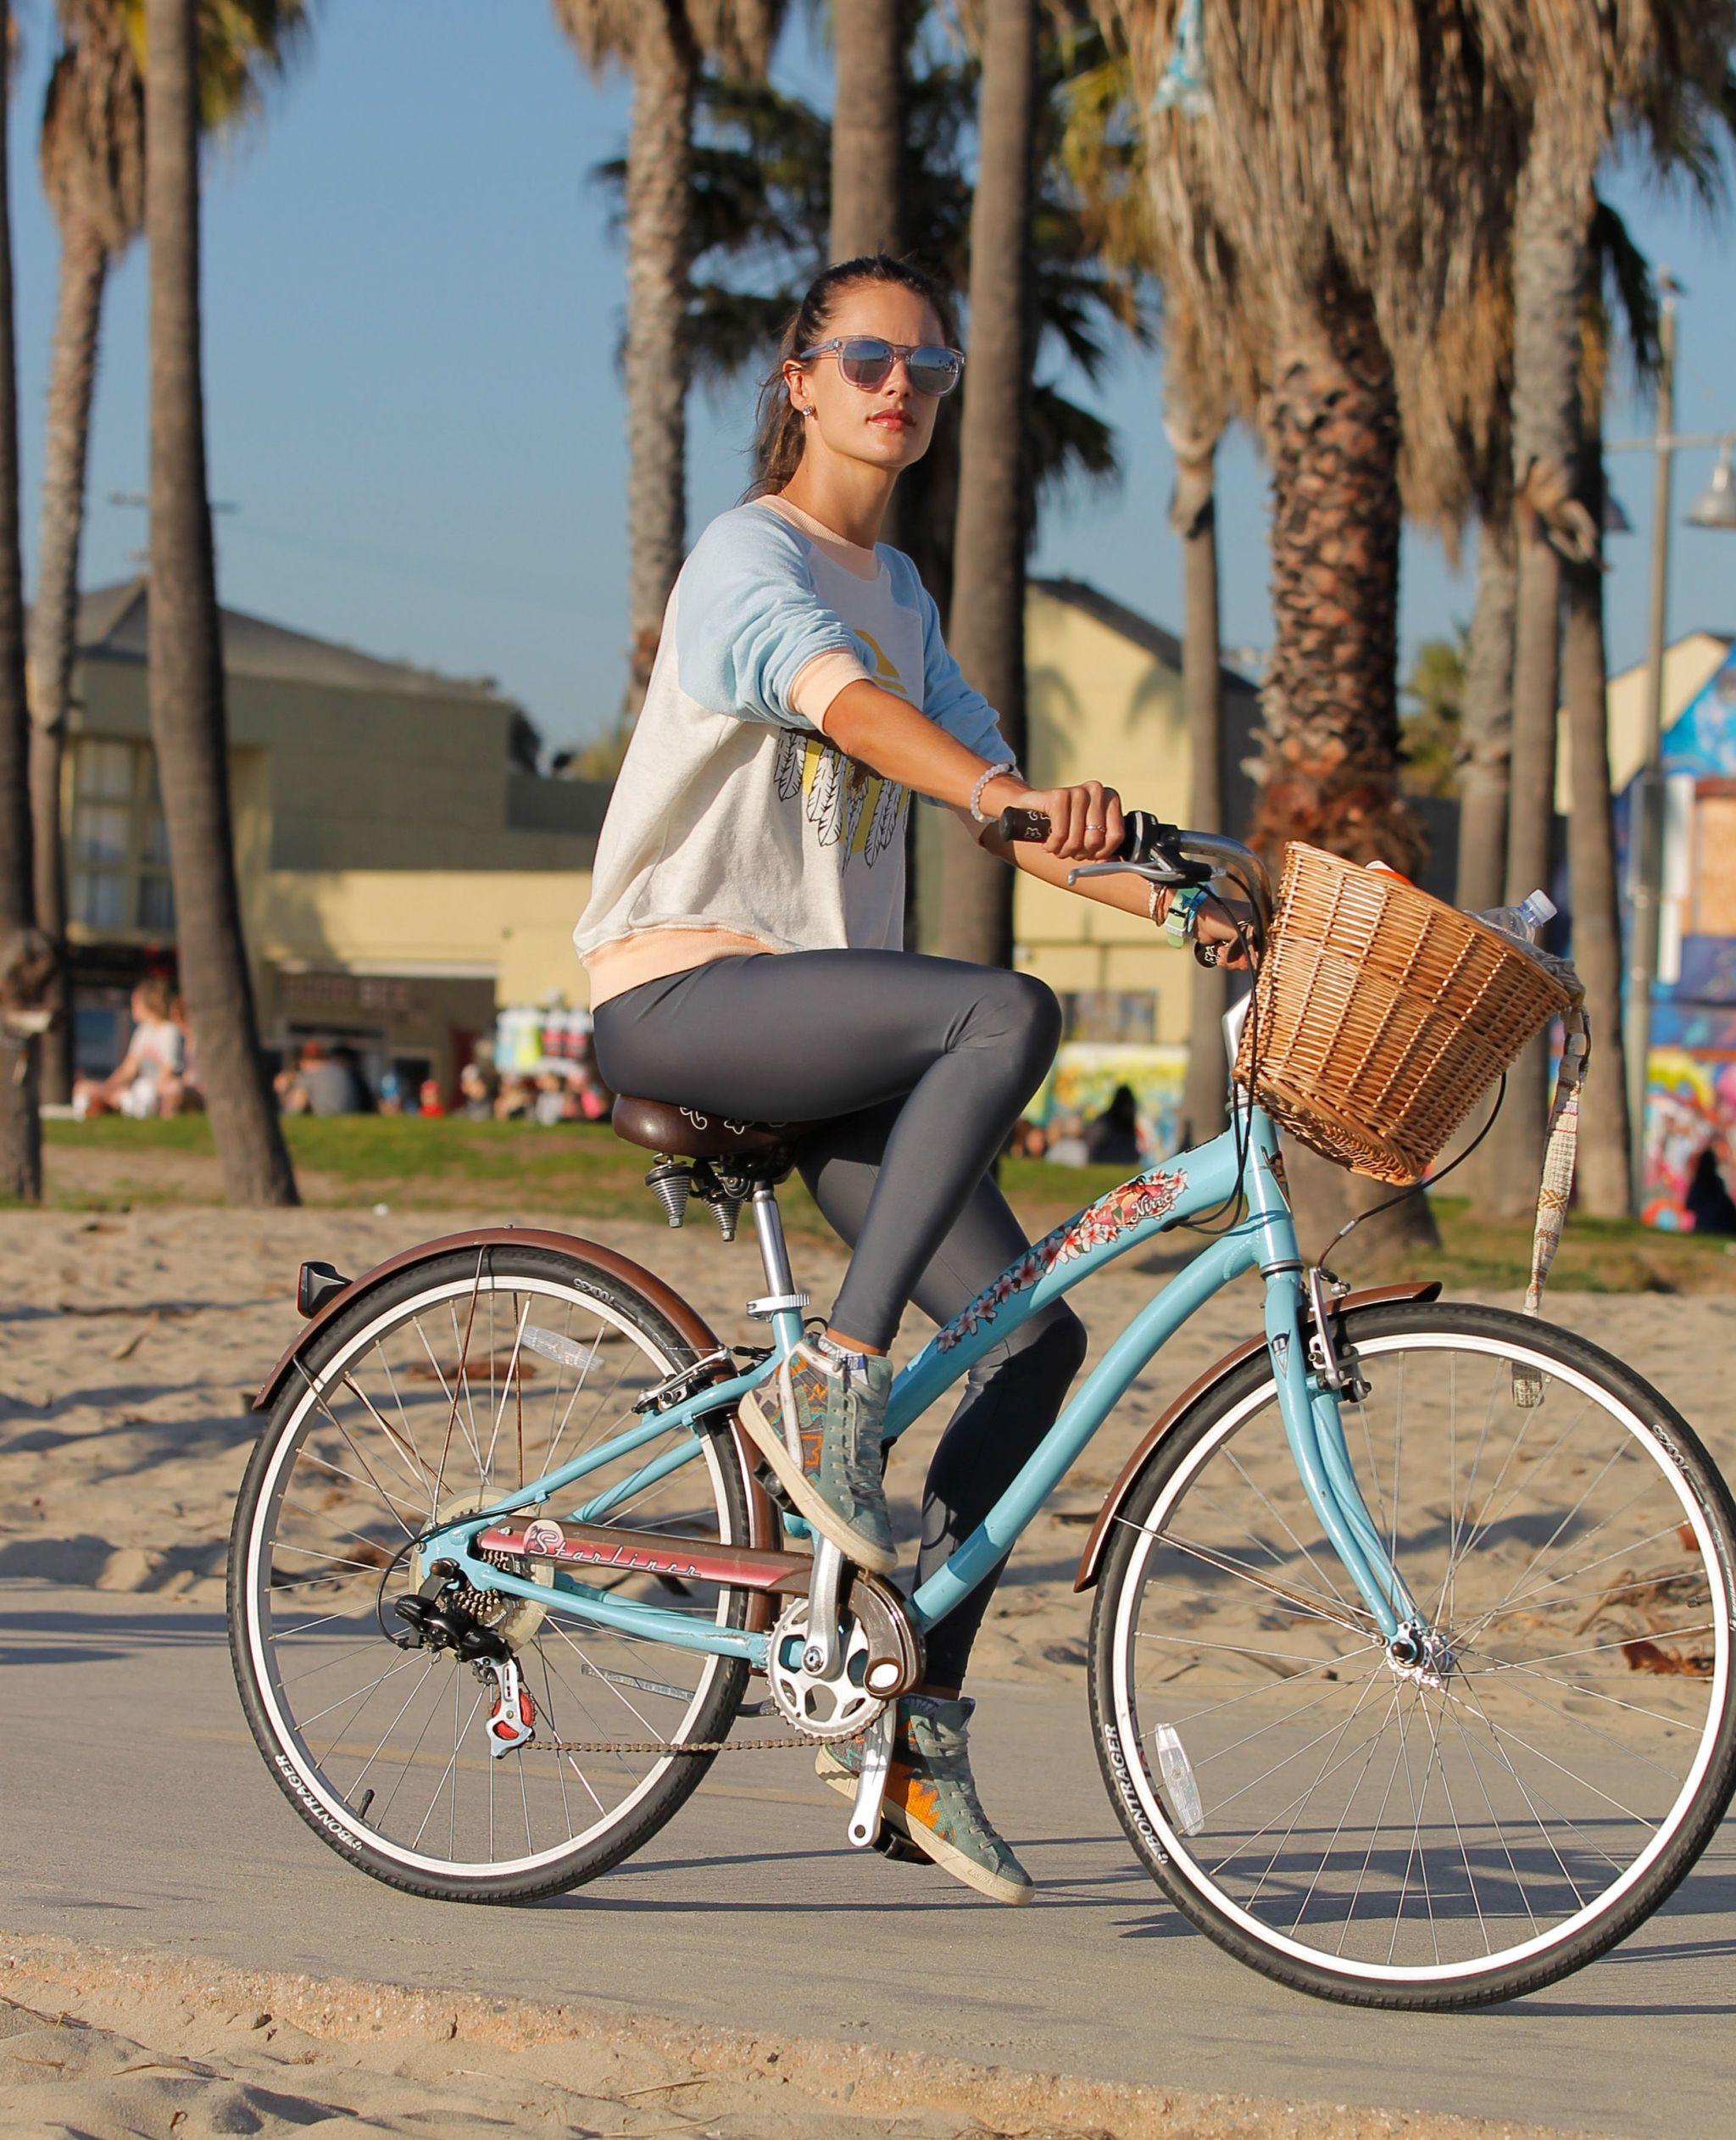 andar en bicicleta adelgaza las piernas